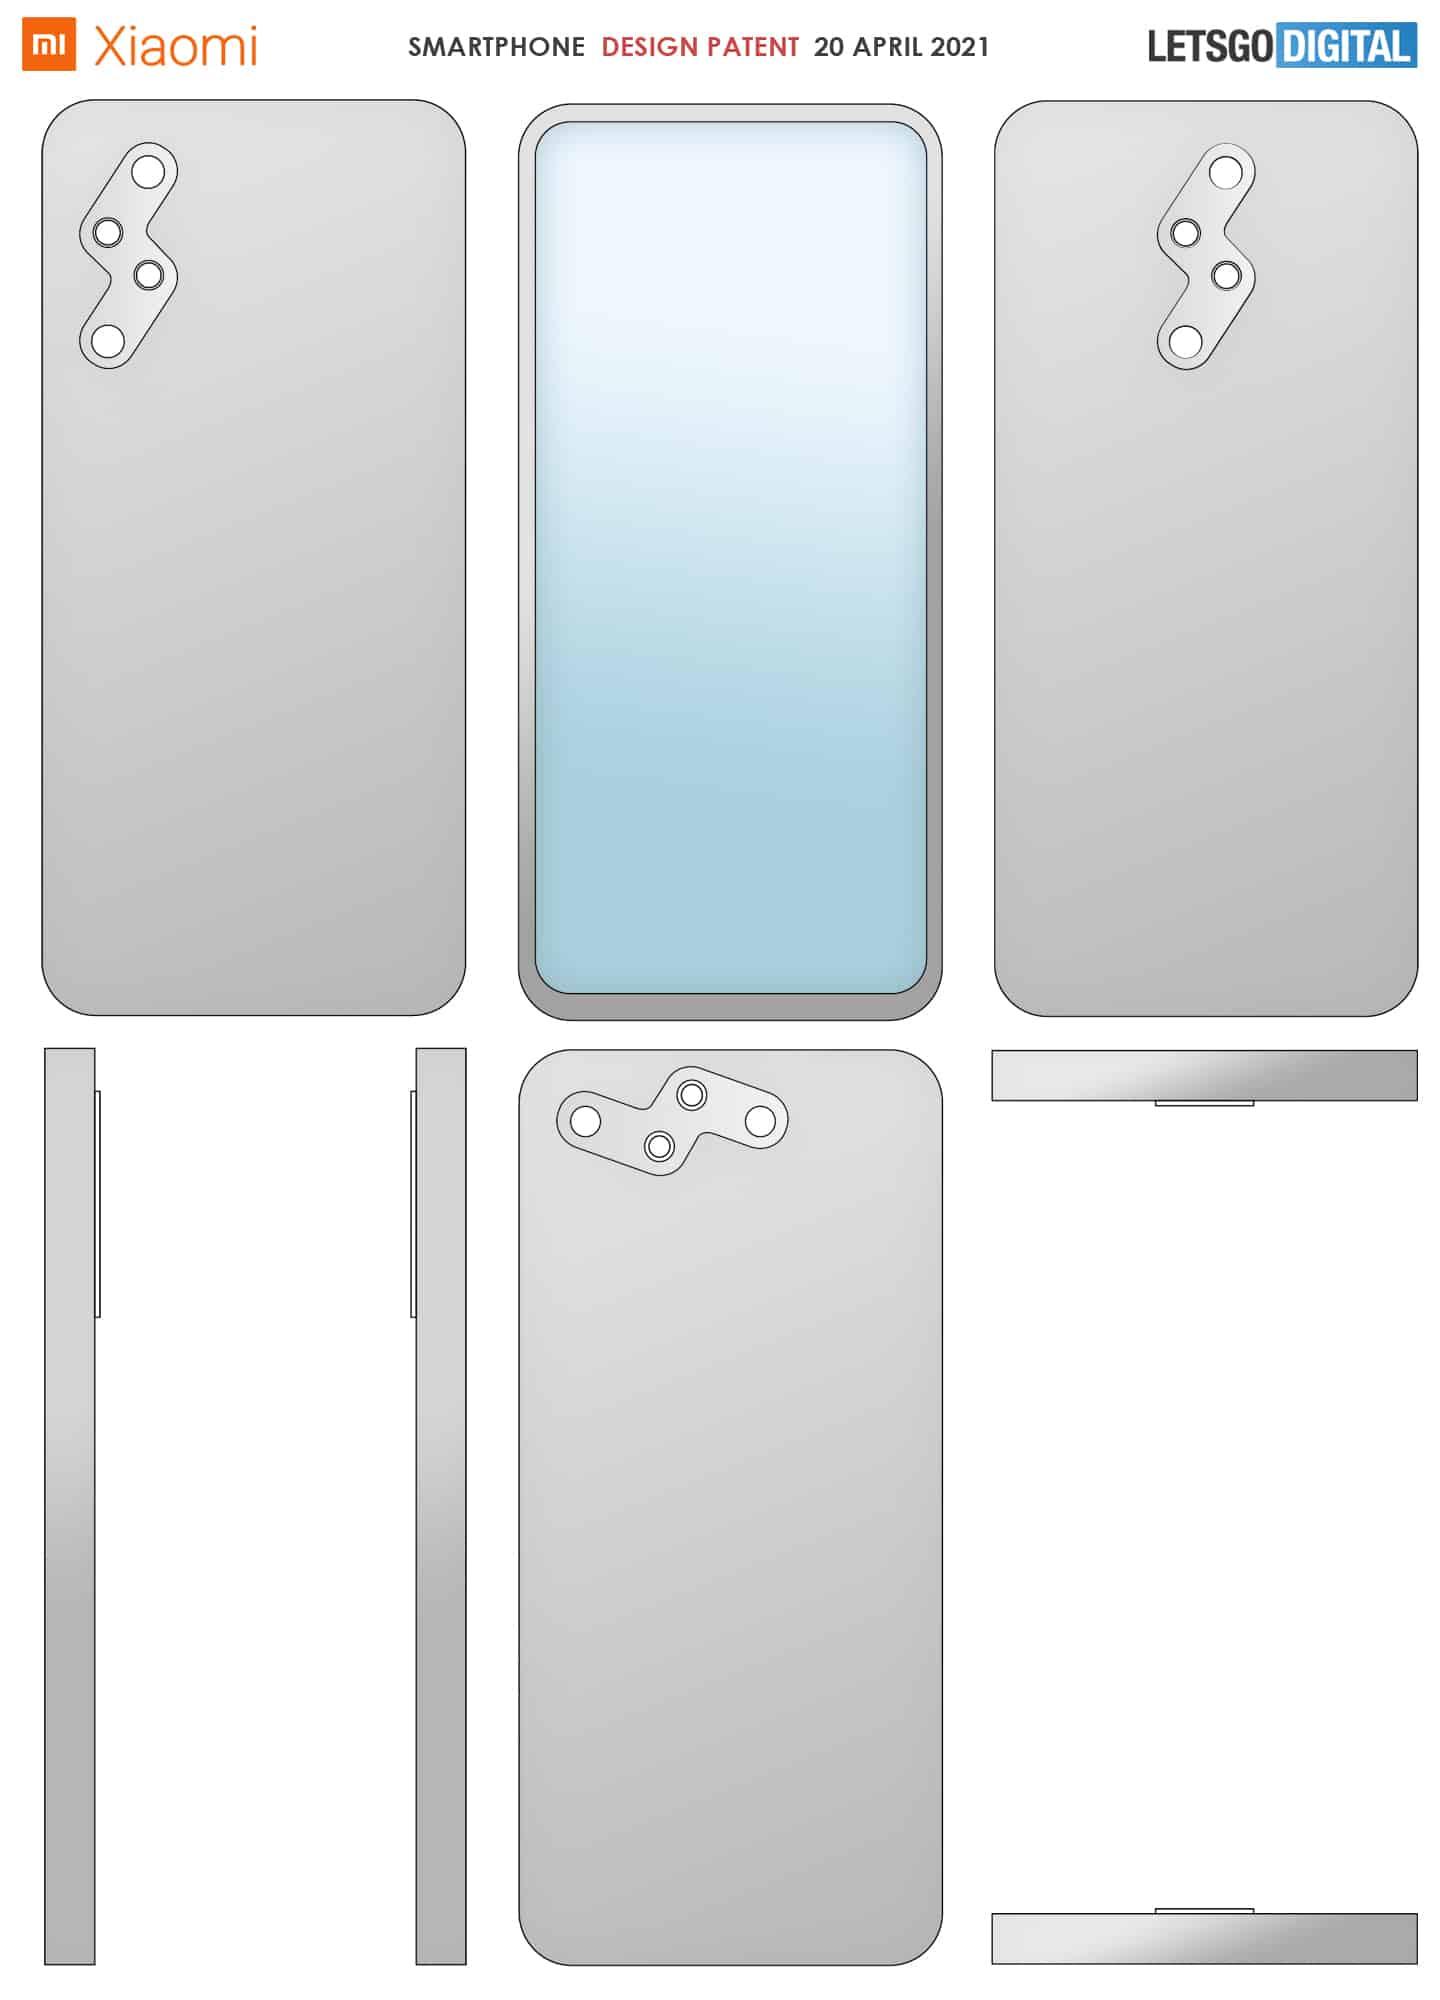 Xiaomi smartphone design thunderbolt camera 1